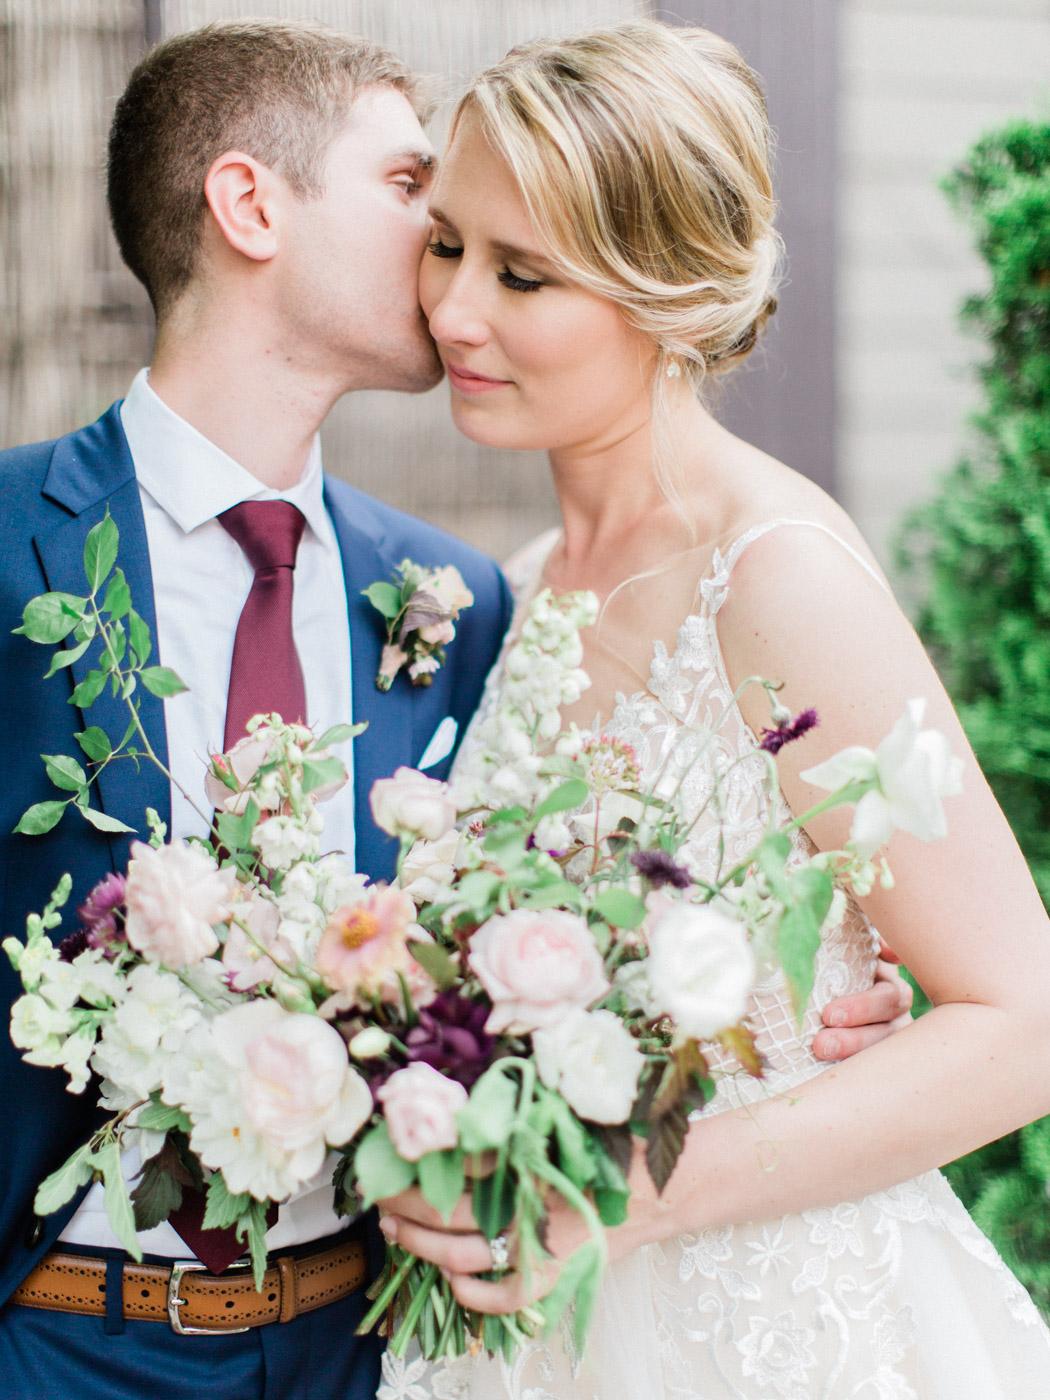 downtown-toronto-wedding-photographer-berkley-fieldhouse-blush-444.jpg